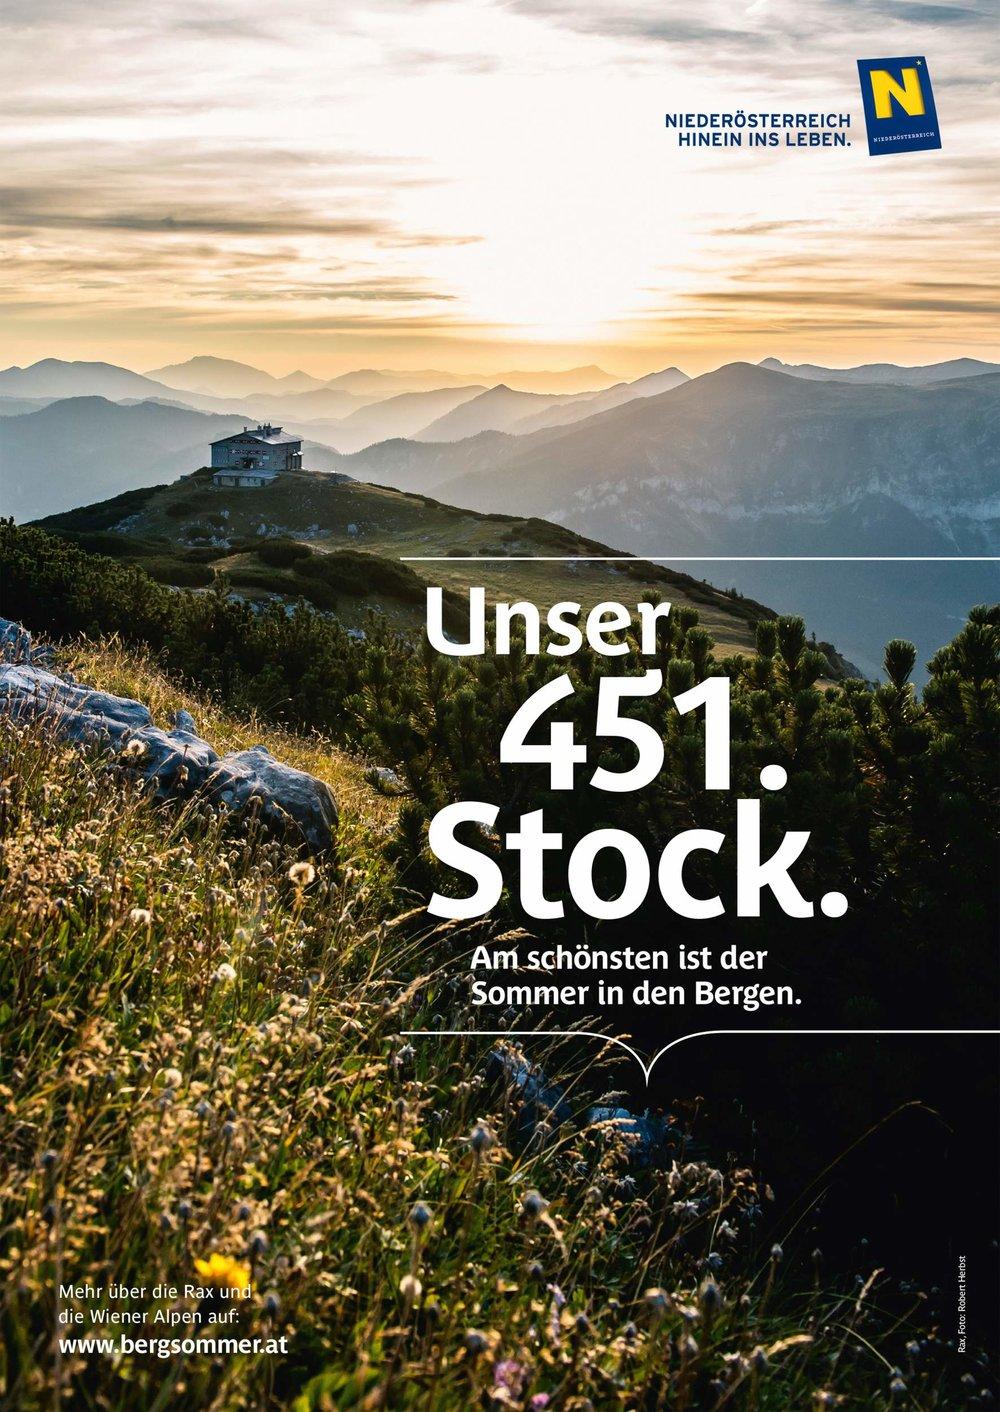 Bild_Printsujet_Bergsommer_Wiener Alpen_Rax_Niederoesterreich.jpg